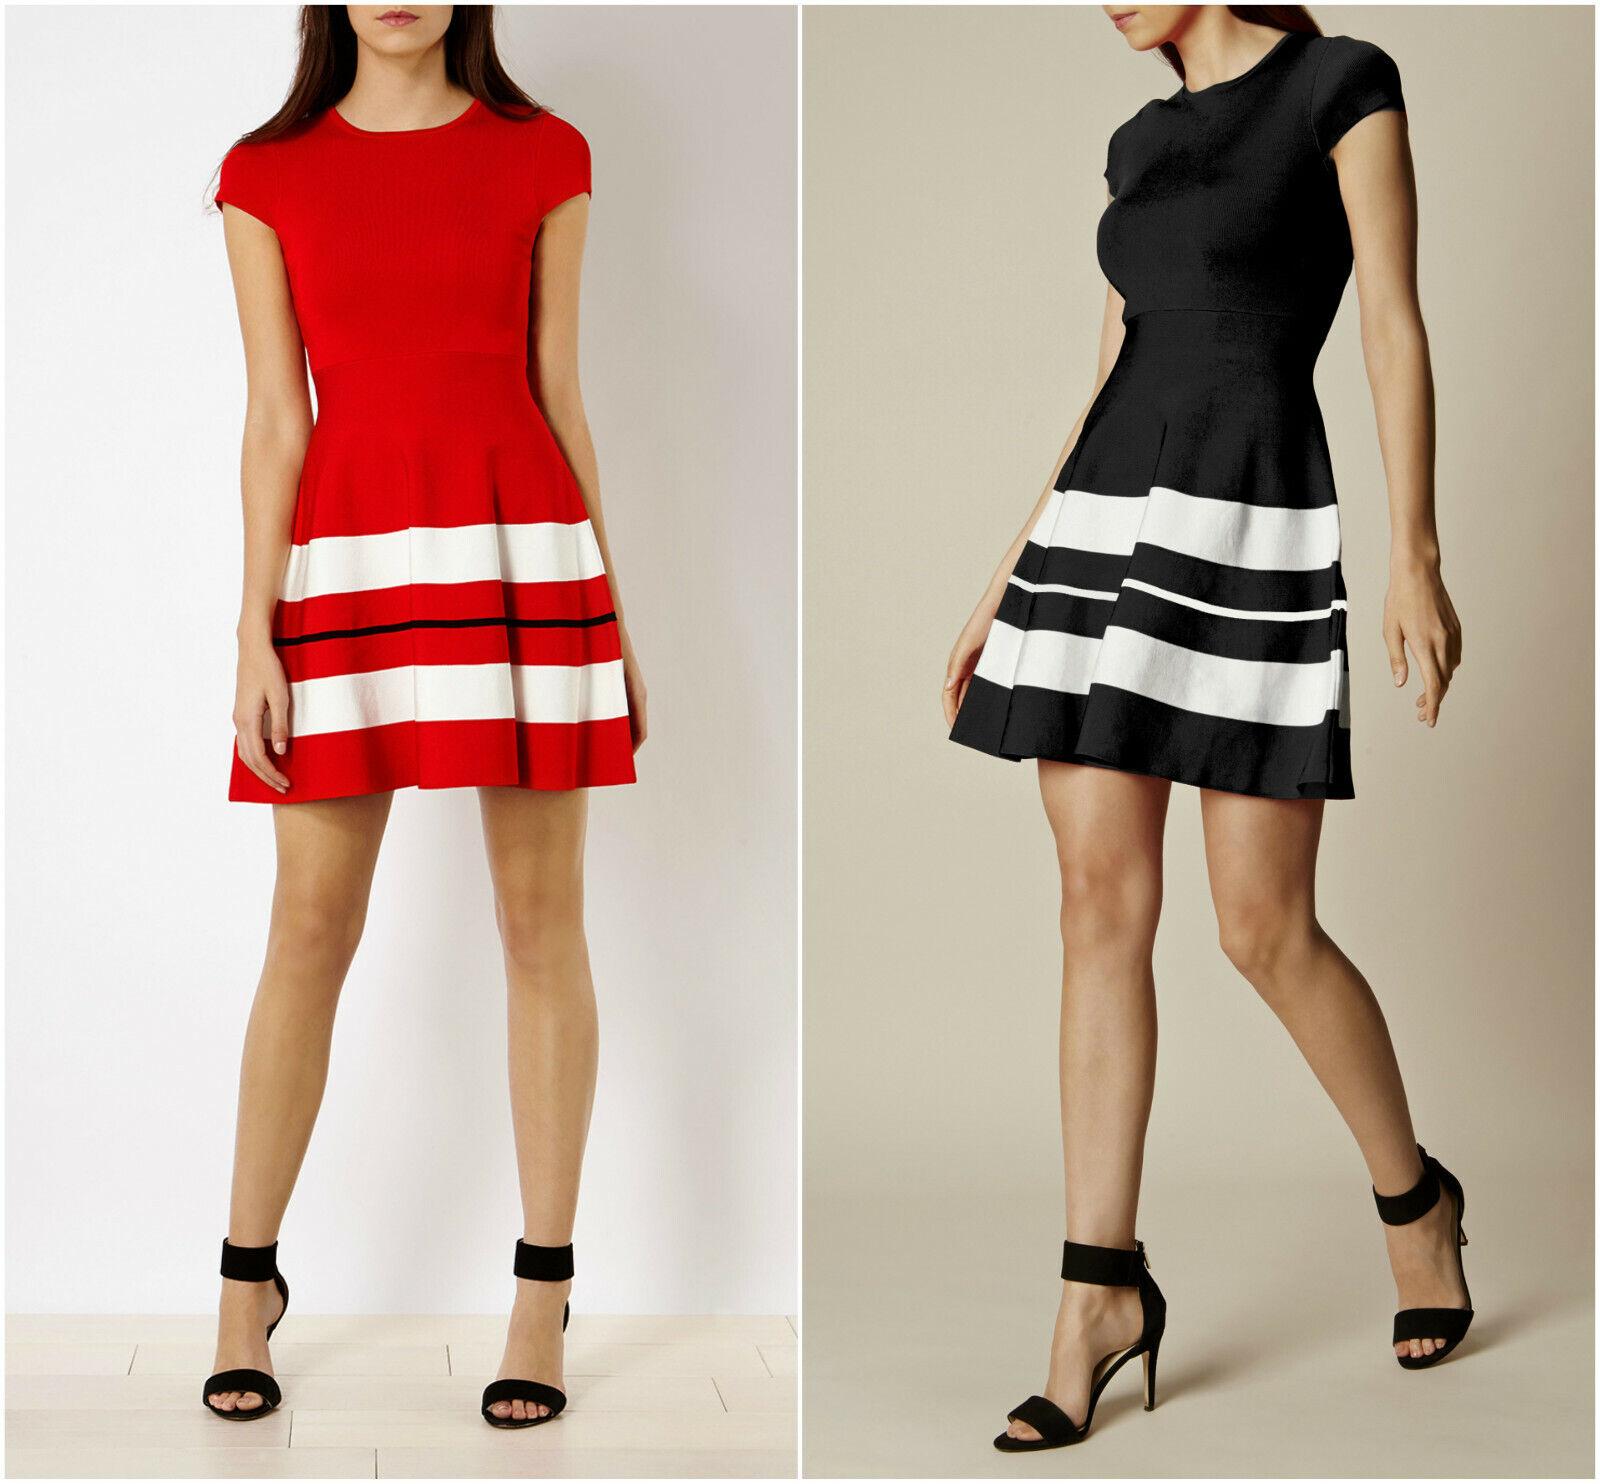 New KAREN MILLEN Stripe BNWT  Bodycon Bandage Knit Dress UK Größe 6 8 16